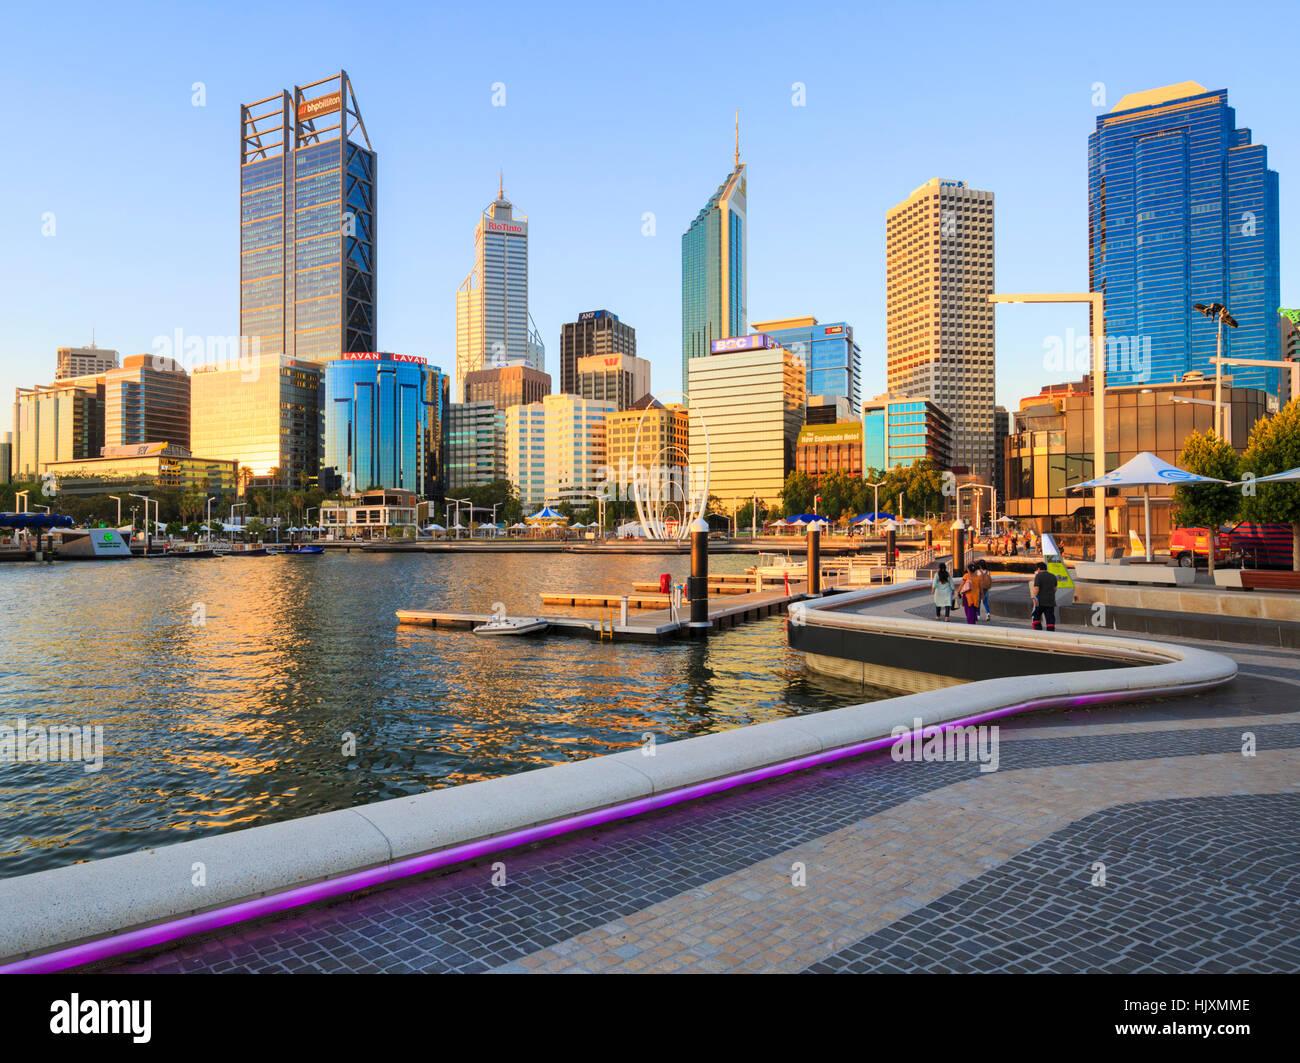 Elizabeth Quay in the late evening summer sun. Perth, Australia - Stock Image